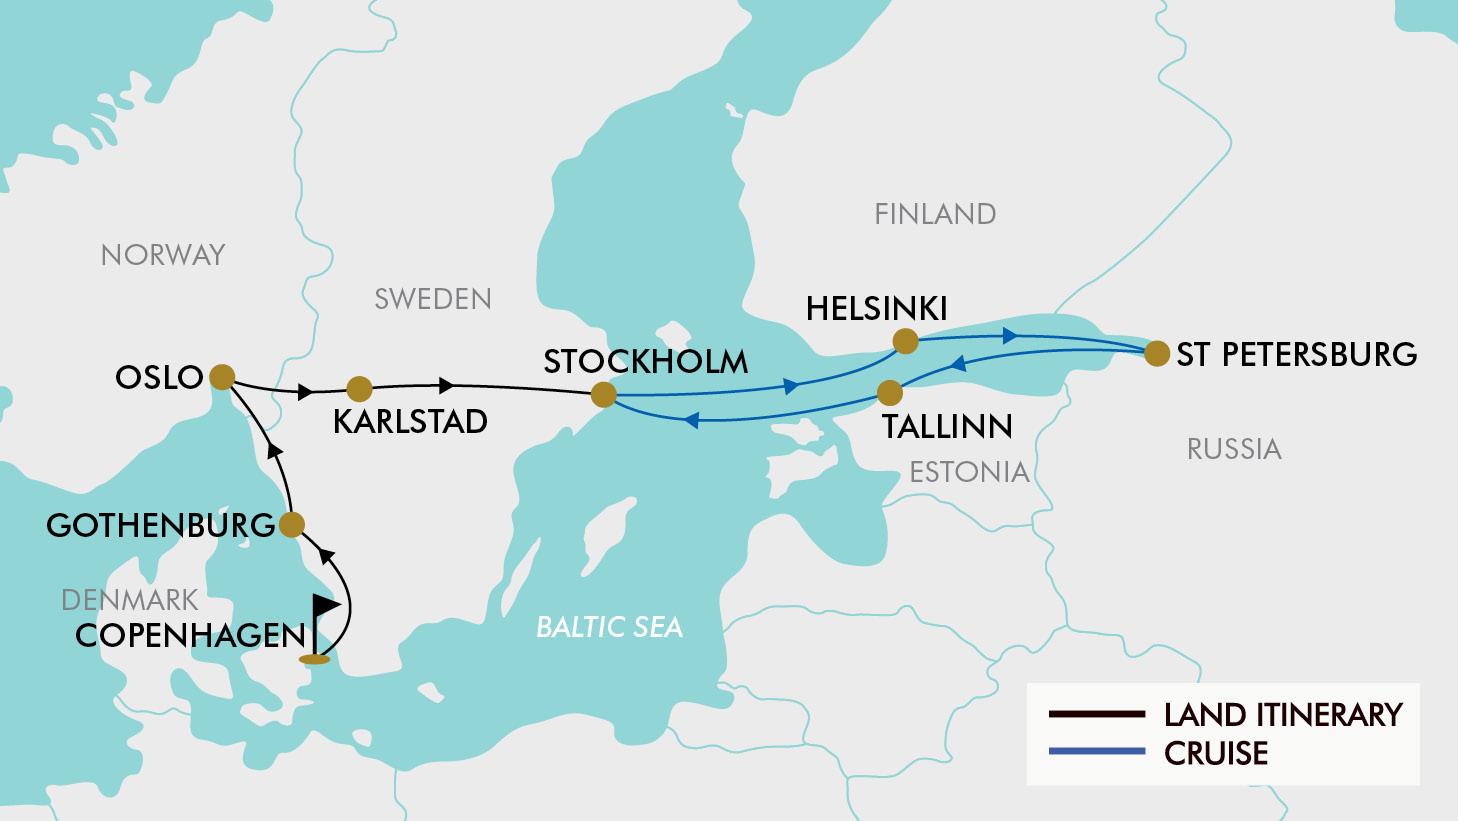 Estonia Escort Service Sankt Petersburg Escort